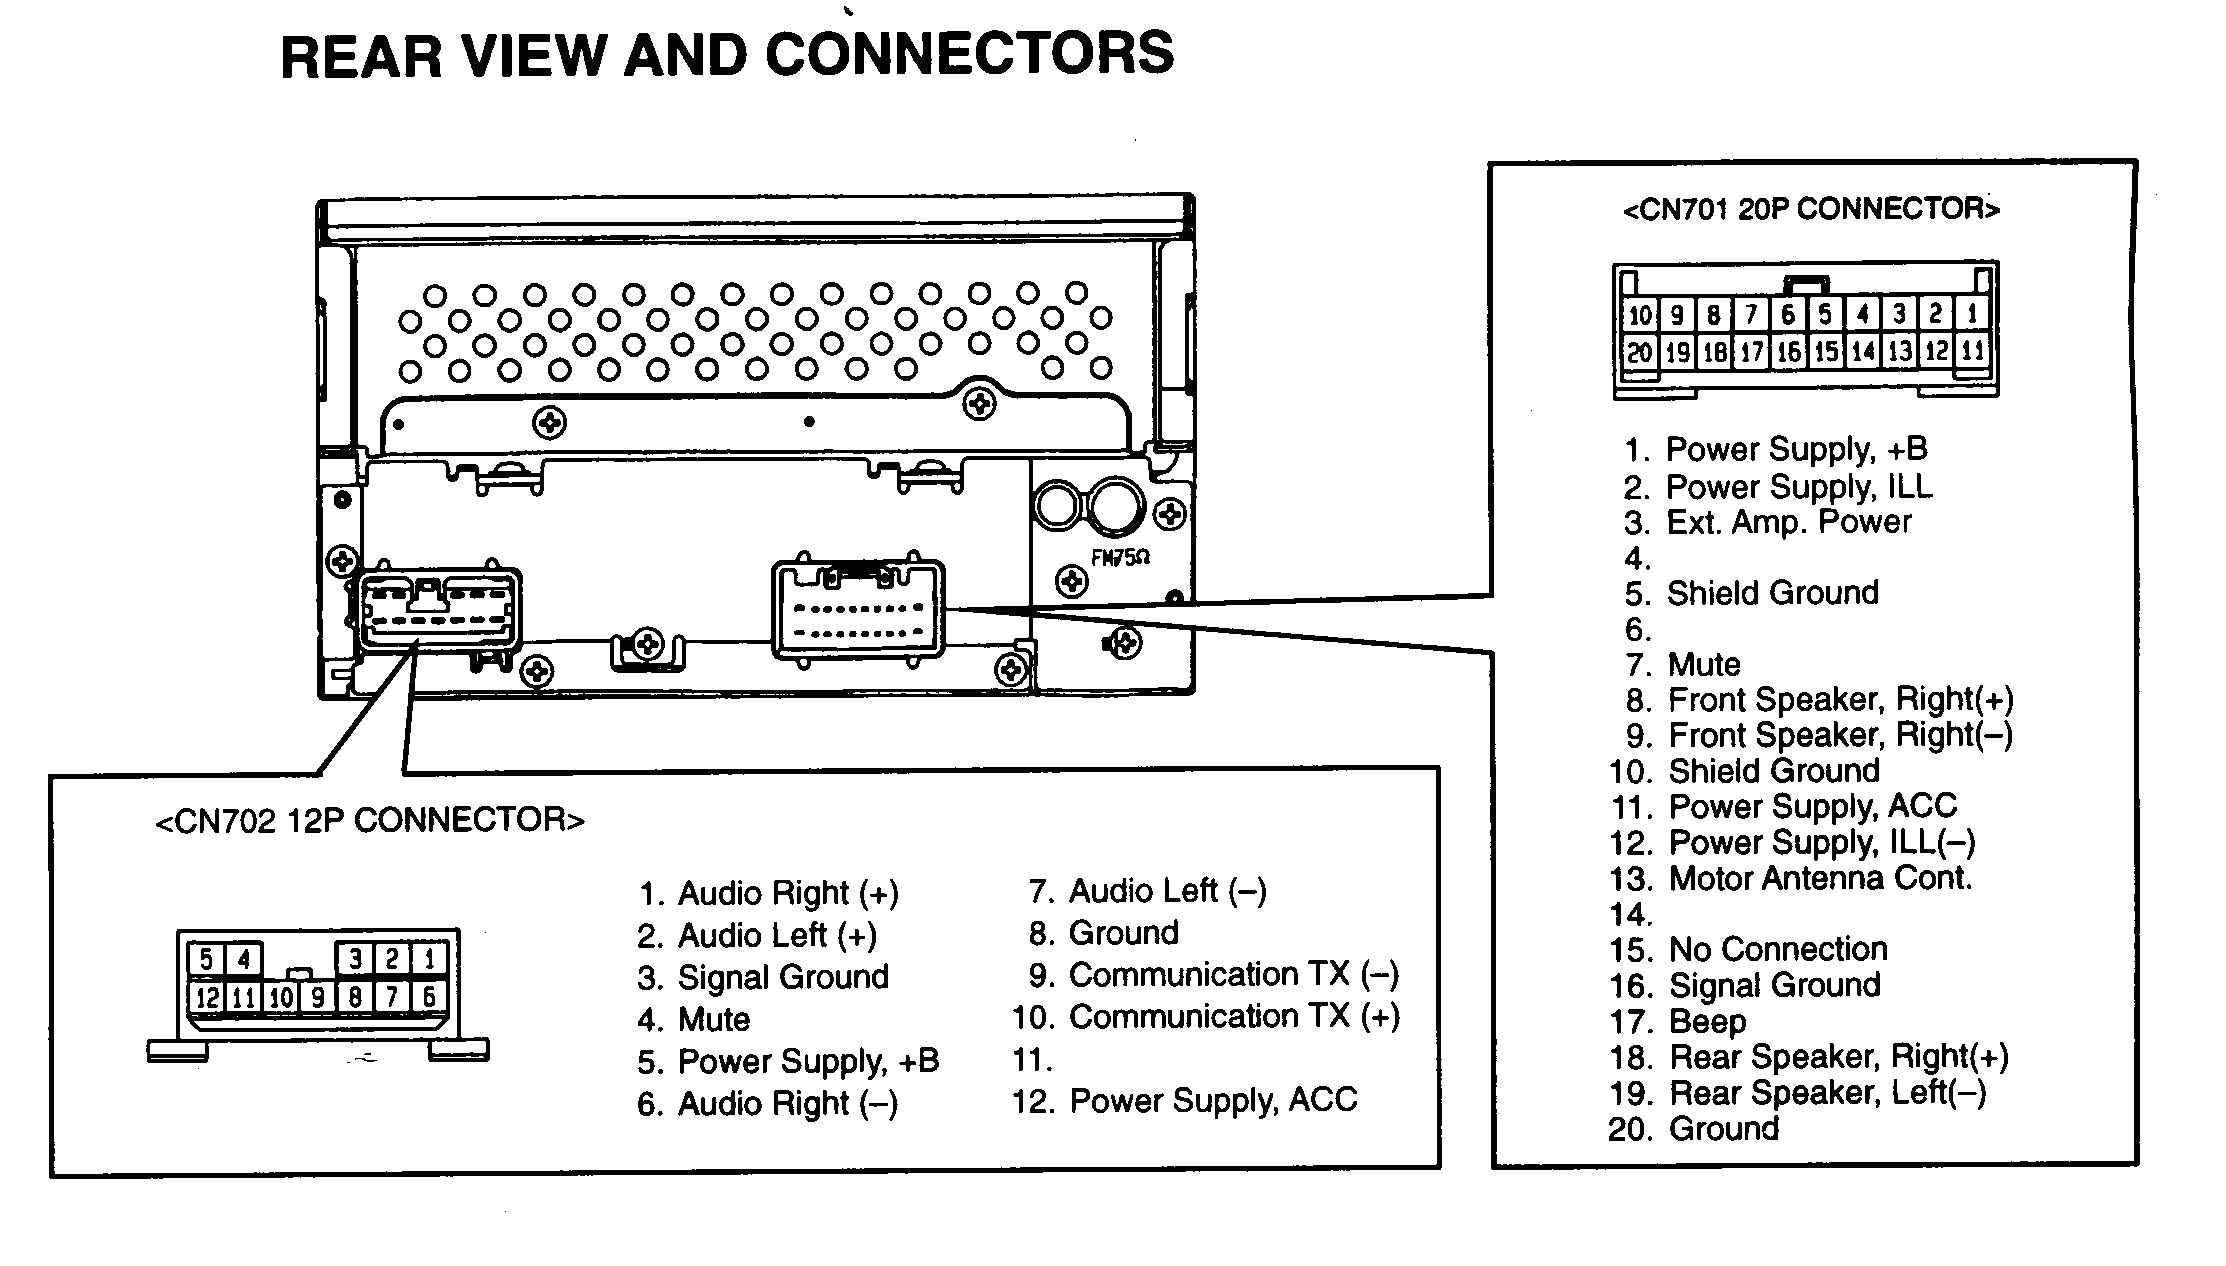 Ford Radio Wiring Harness Diagram Wiring Diagrams Likewise Car Stereo Wiring Harness Diagram Further